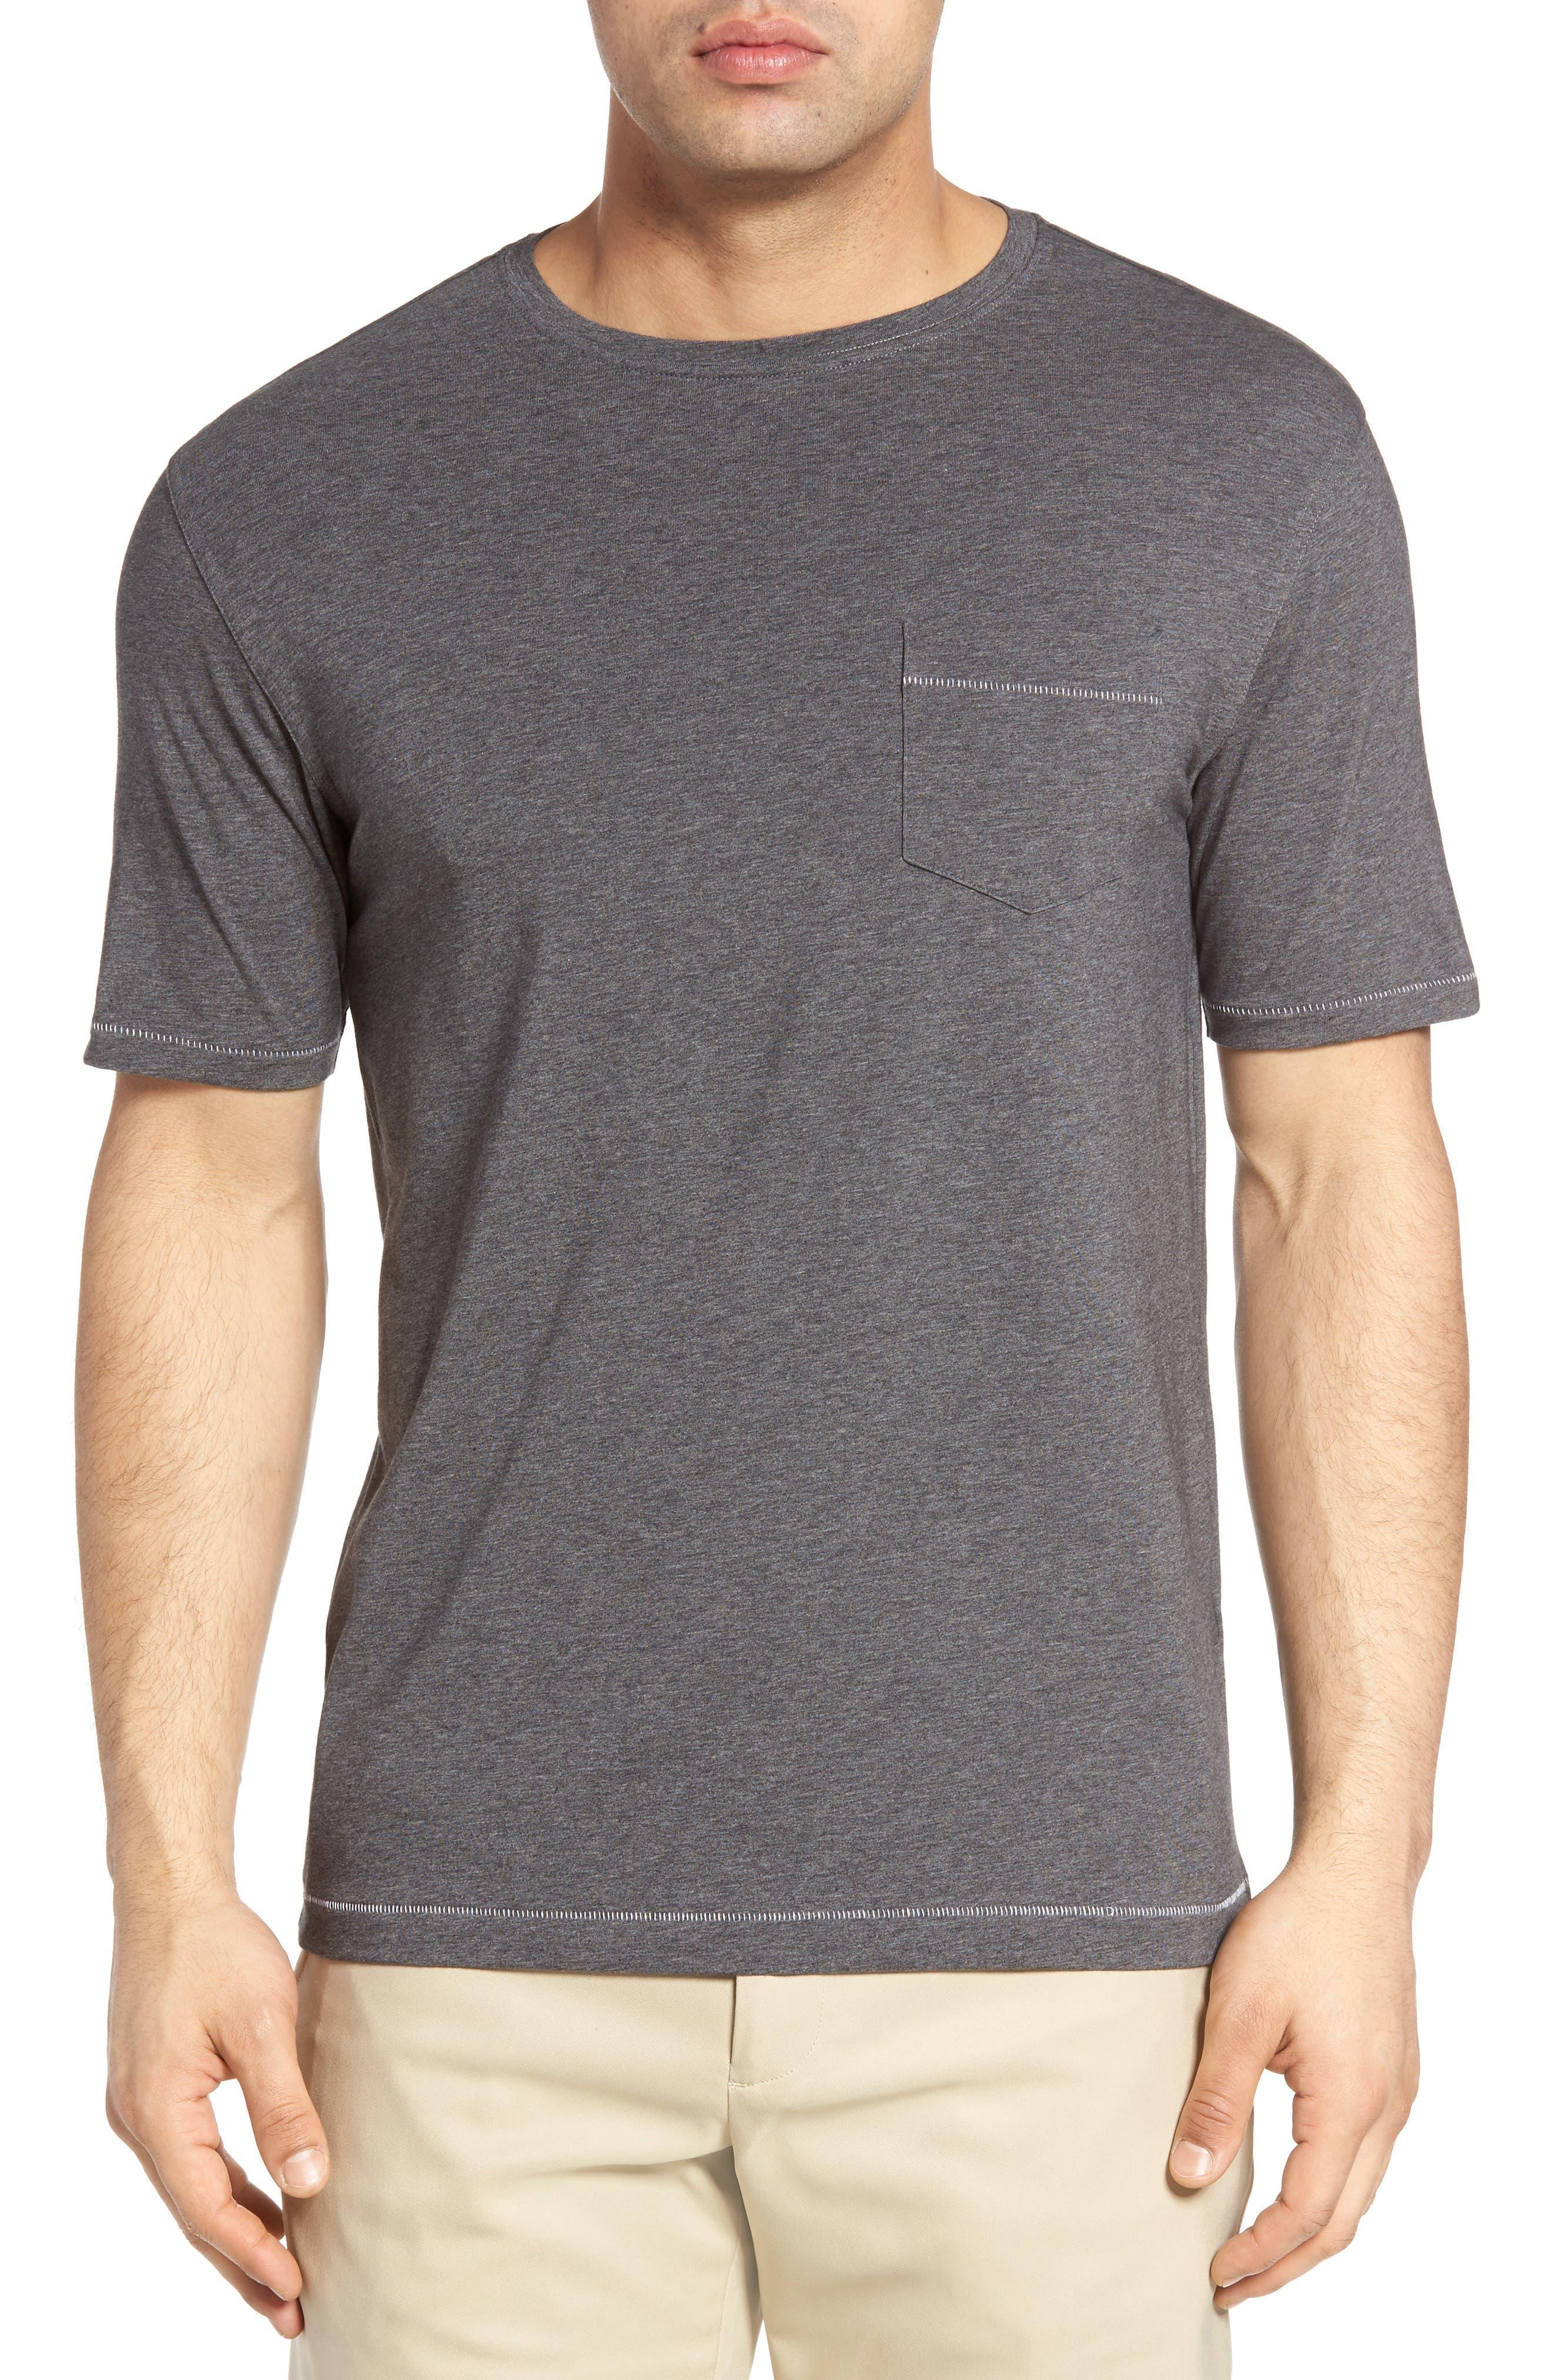 R18 Pocket T-Shirt,                         Main,                         color, Charcoal Heather